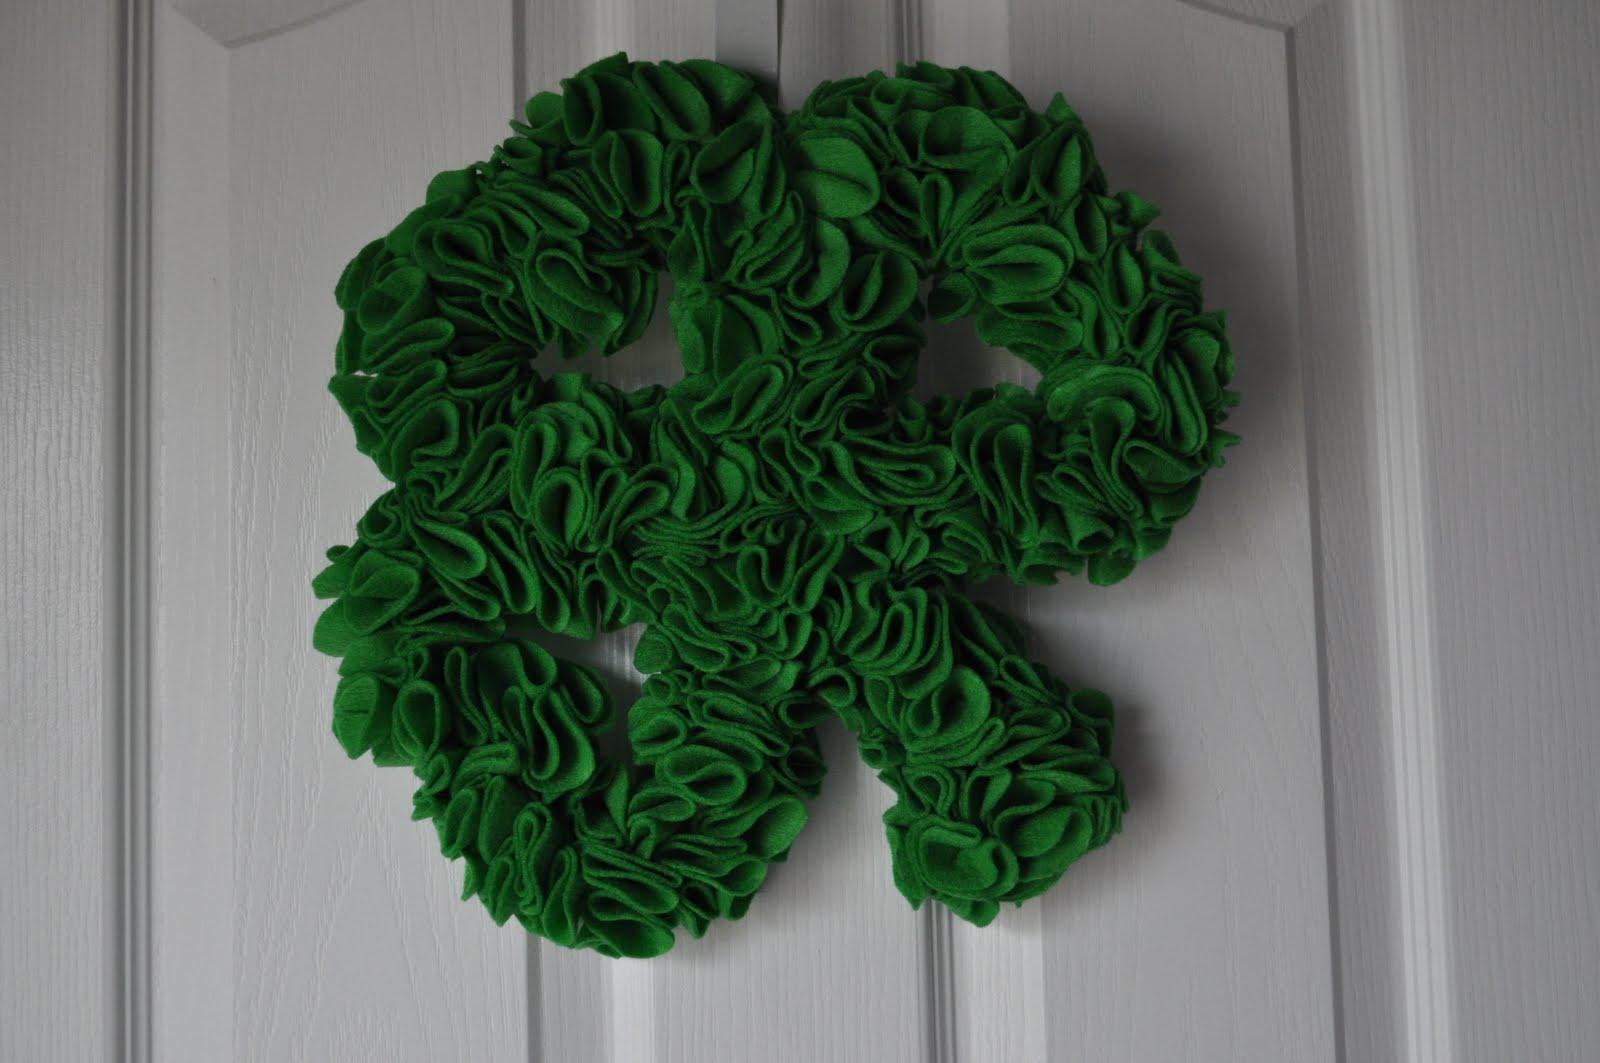 Office St Patrick's Day Ideas from importtestsite.files.wordpress.com